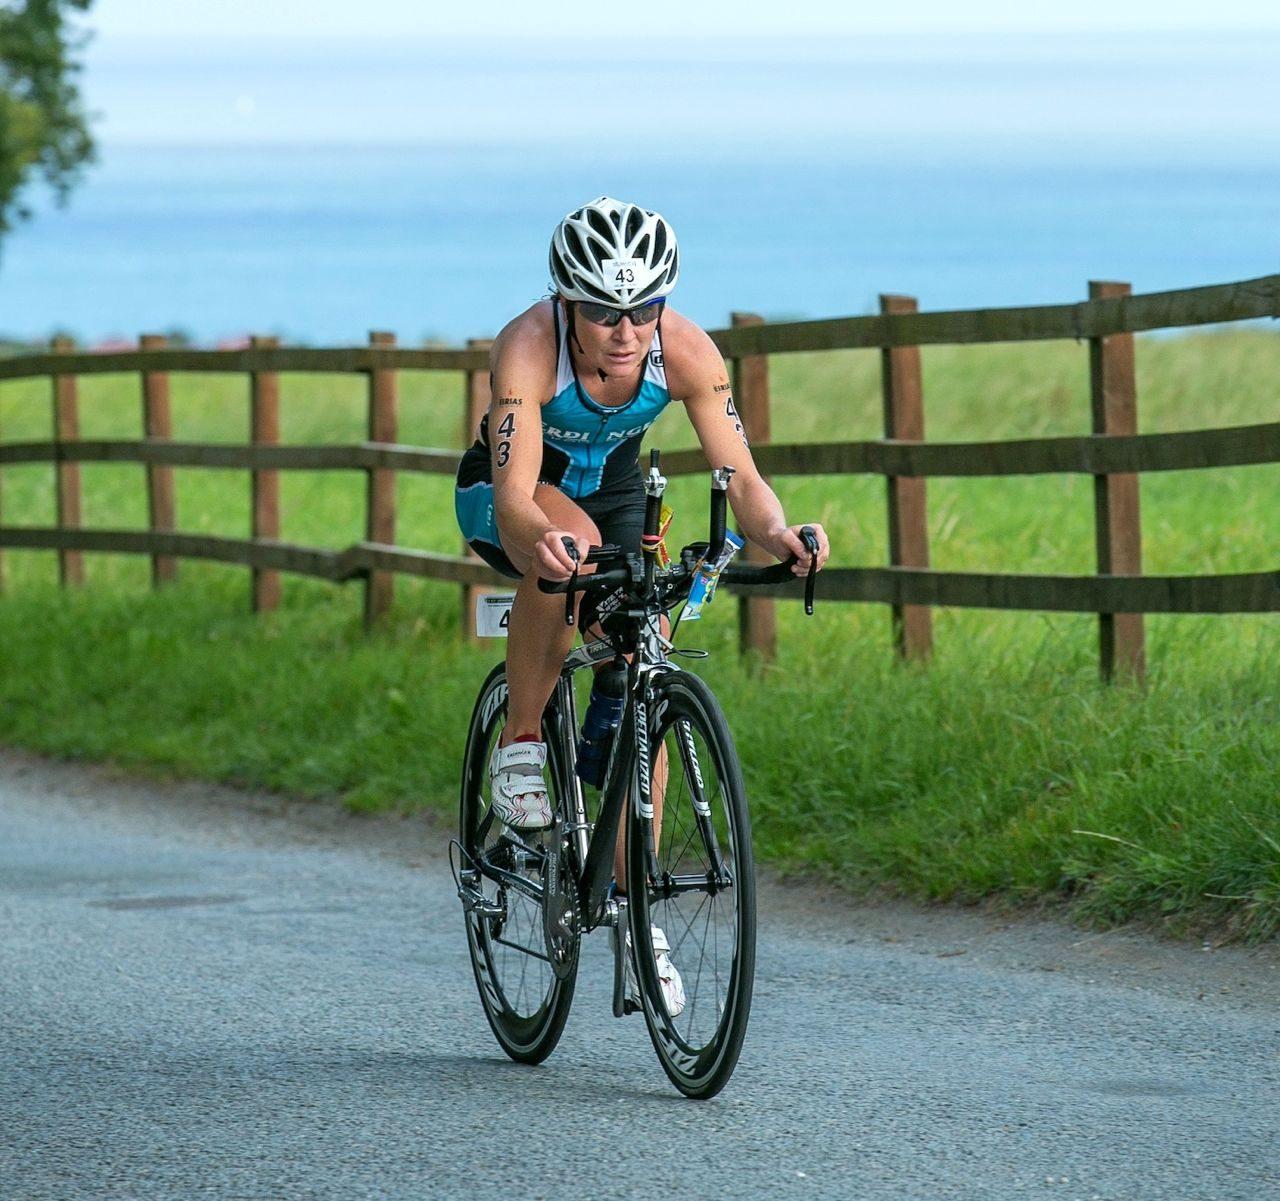 Carol Bridge racing at the Eirias Triathlon 2014